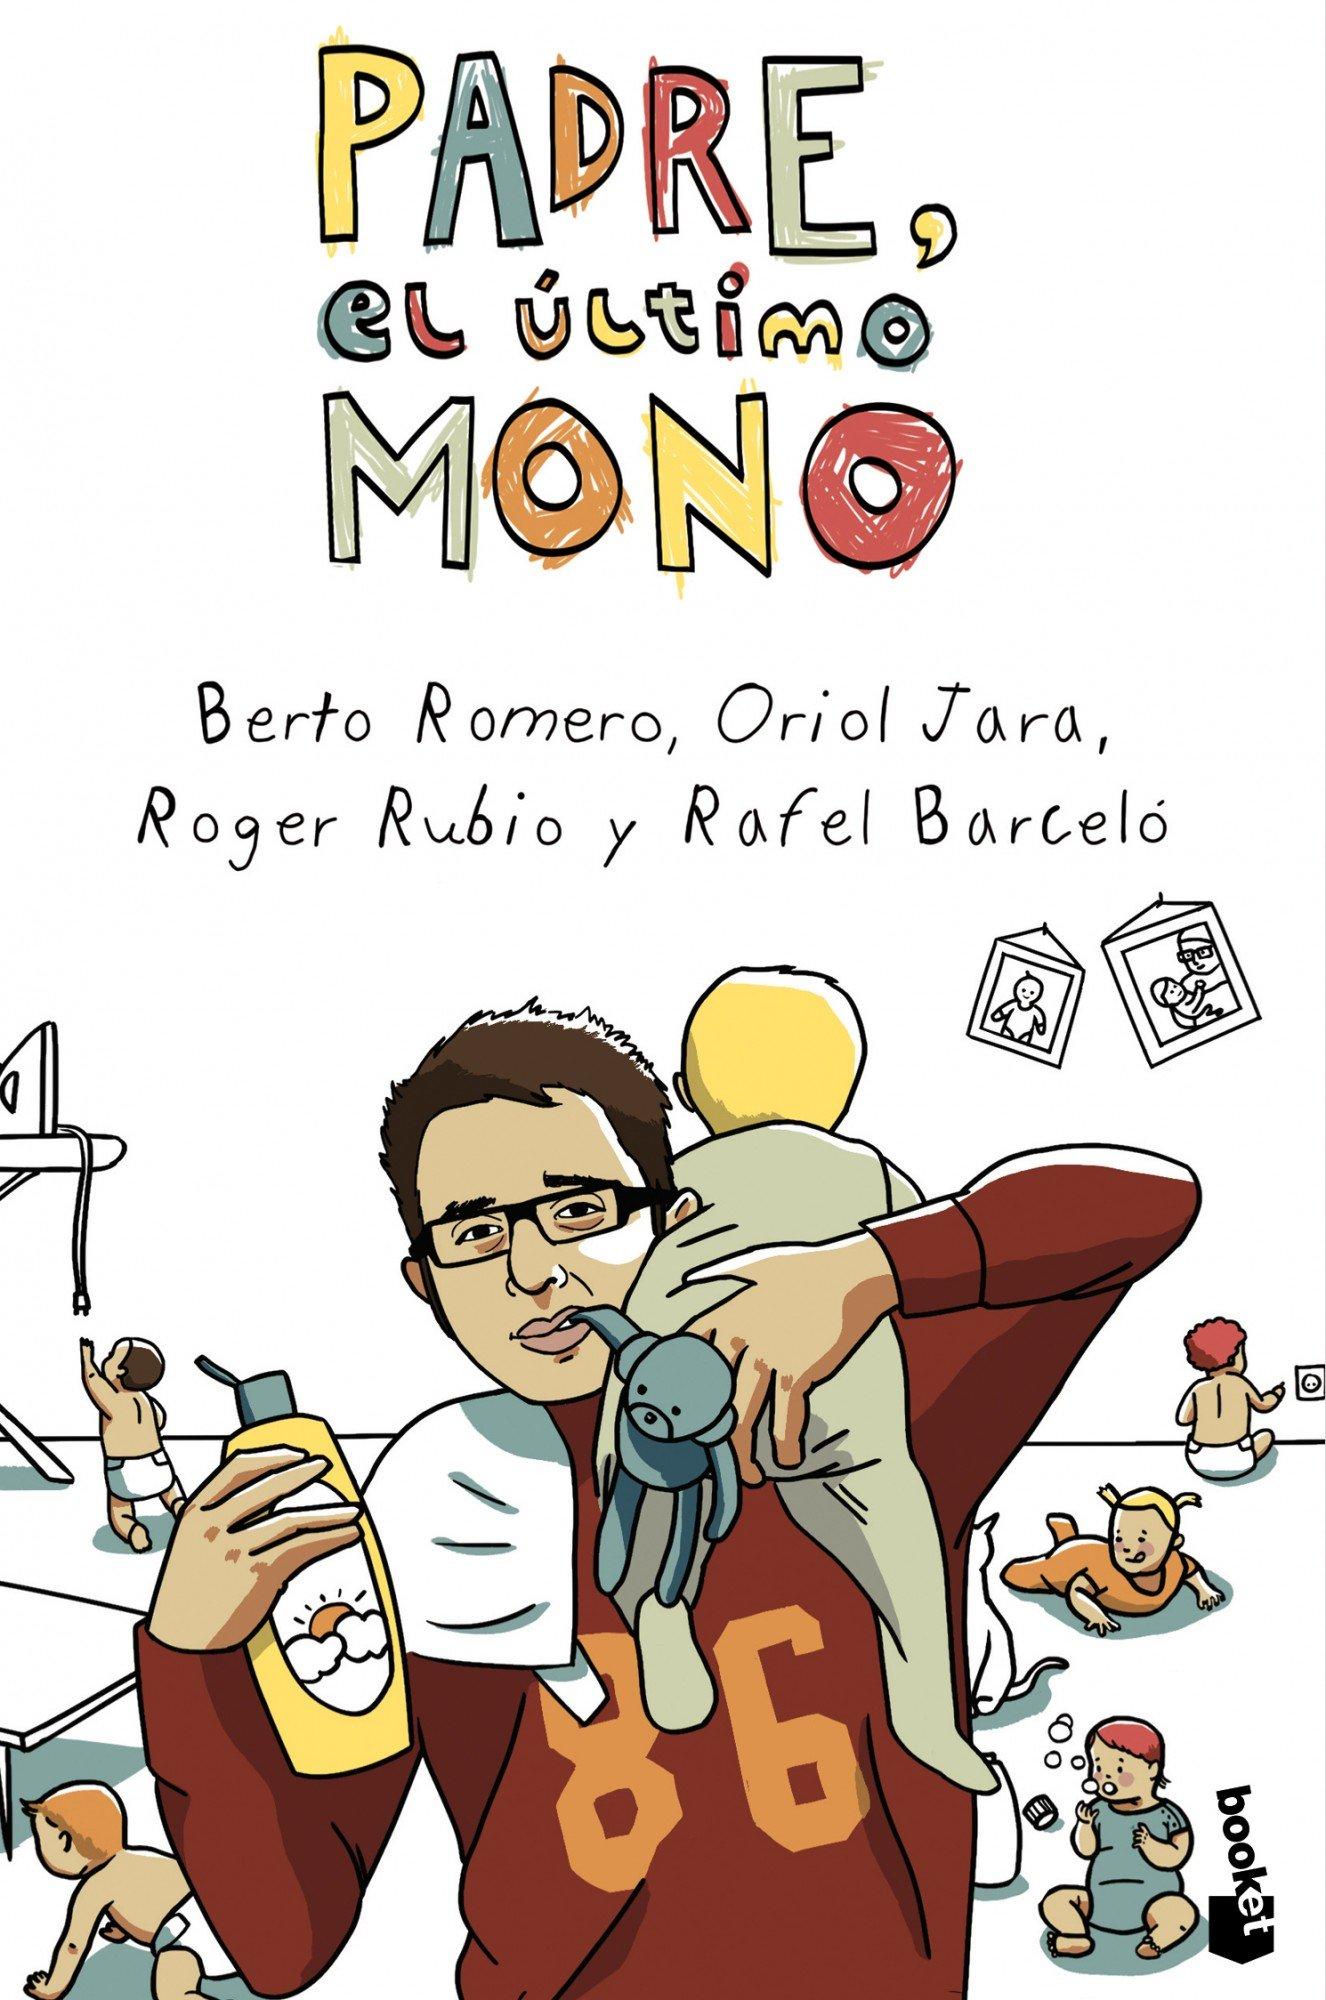 Padre, el último mono (Diversos) Tapa blanda – 12 feb 2013 Berto Romero Oriol Jara Roger Rubio Rafel Barceló